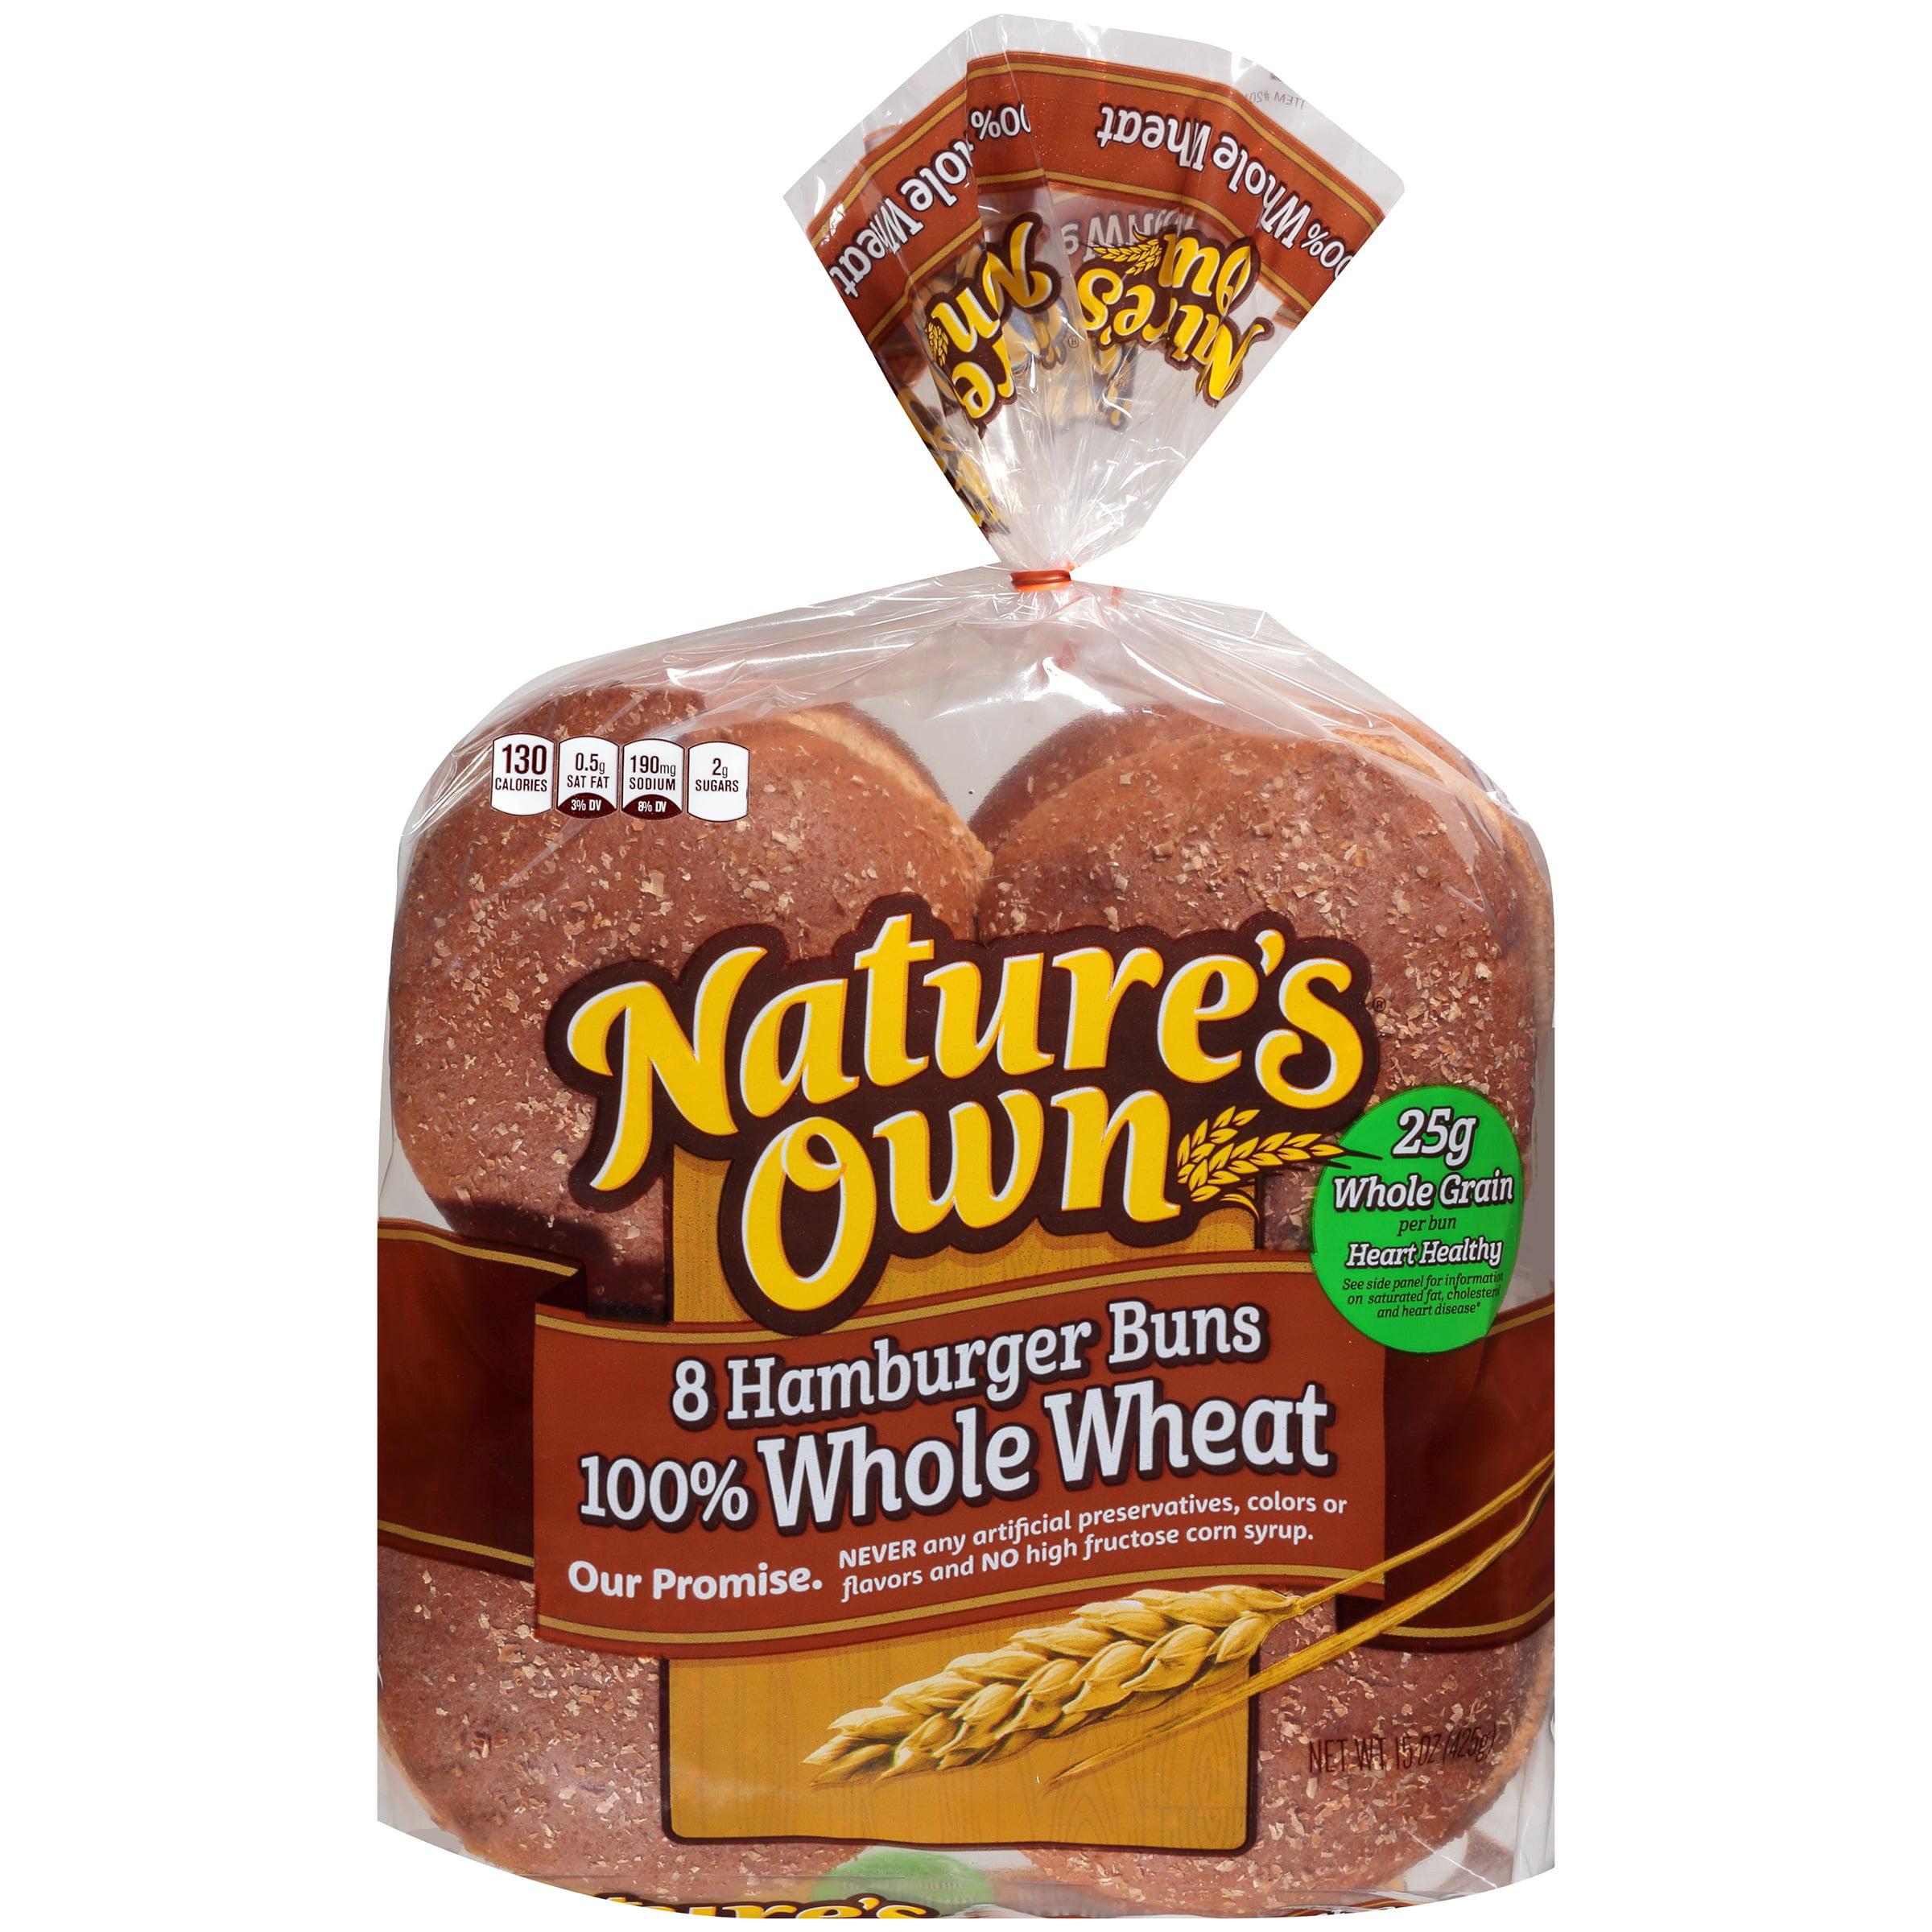 Nature's Own® 100% Whole Wheat Hamburger Buns 15 oz. Bag